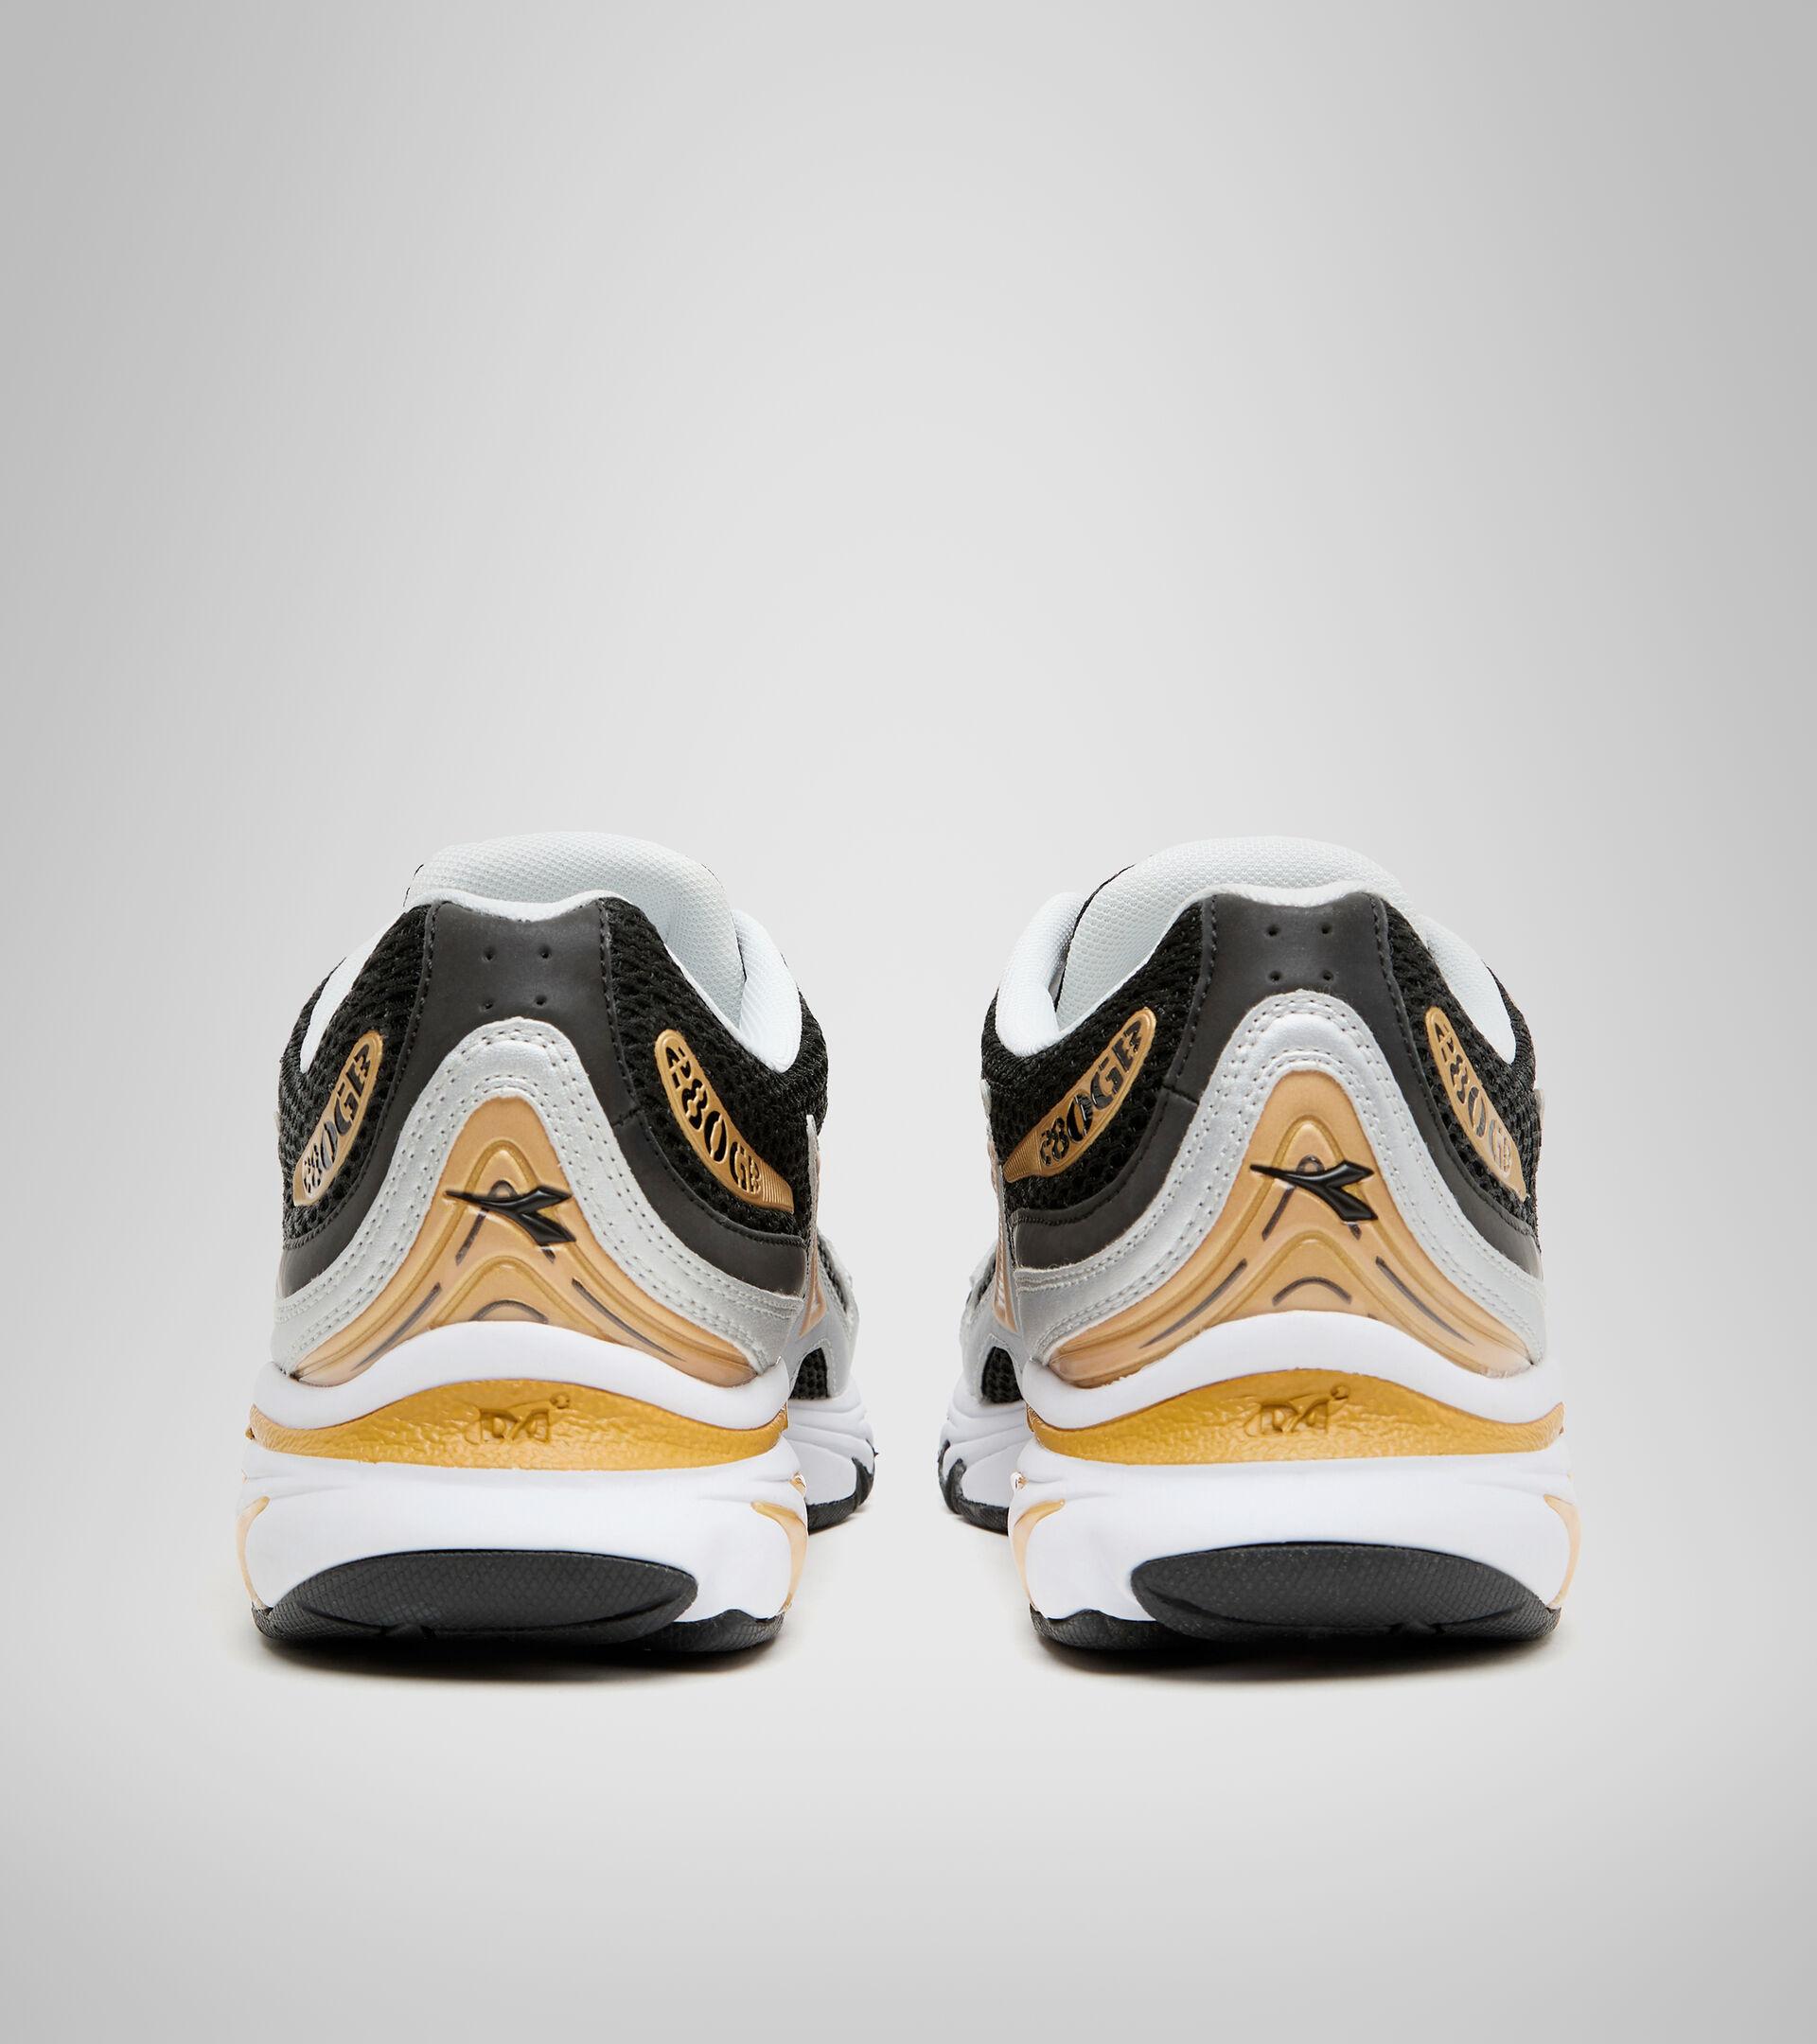 Footwear Sportswear UNISEX MYTHOS PROPULSION 280 NERO/ORO Diadora